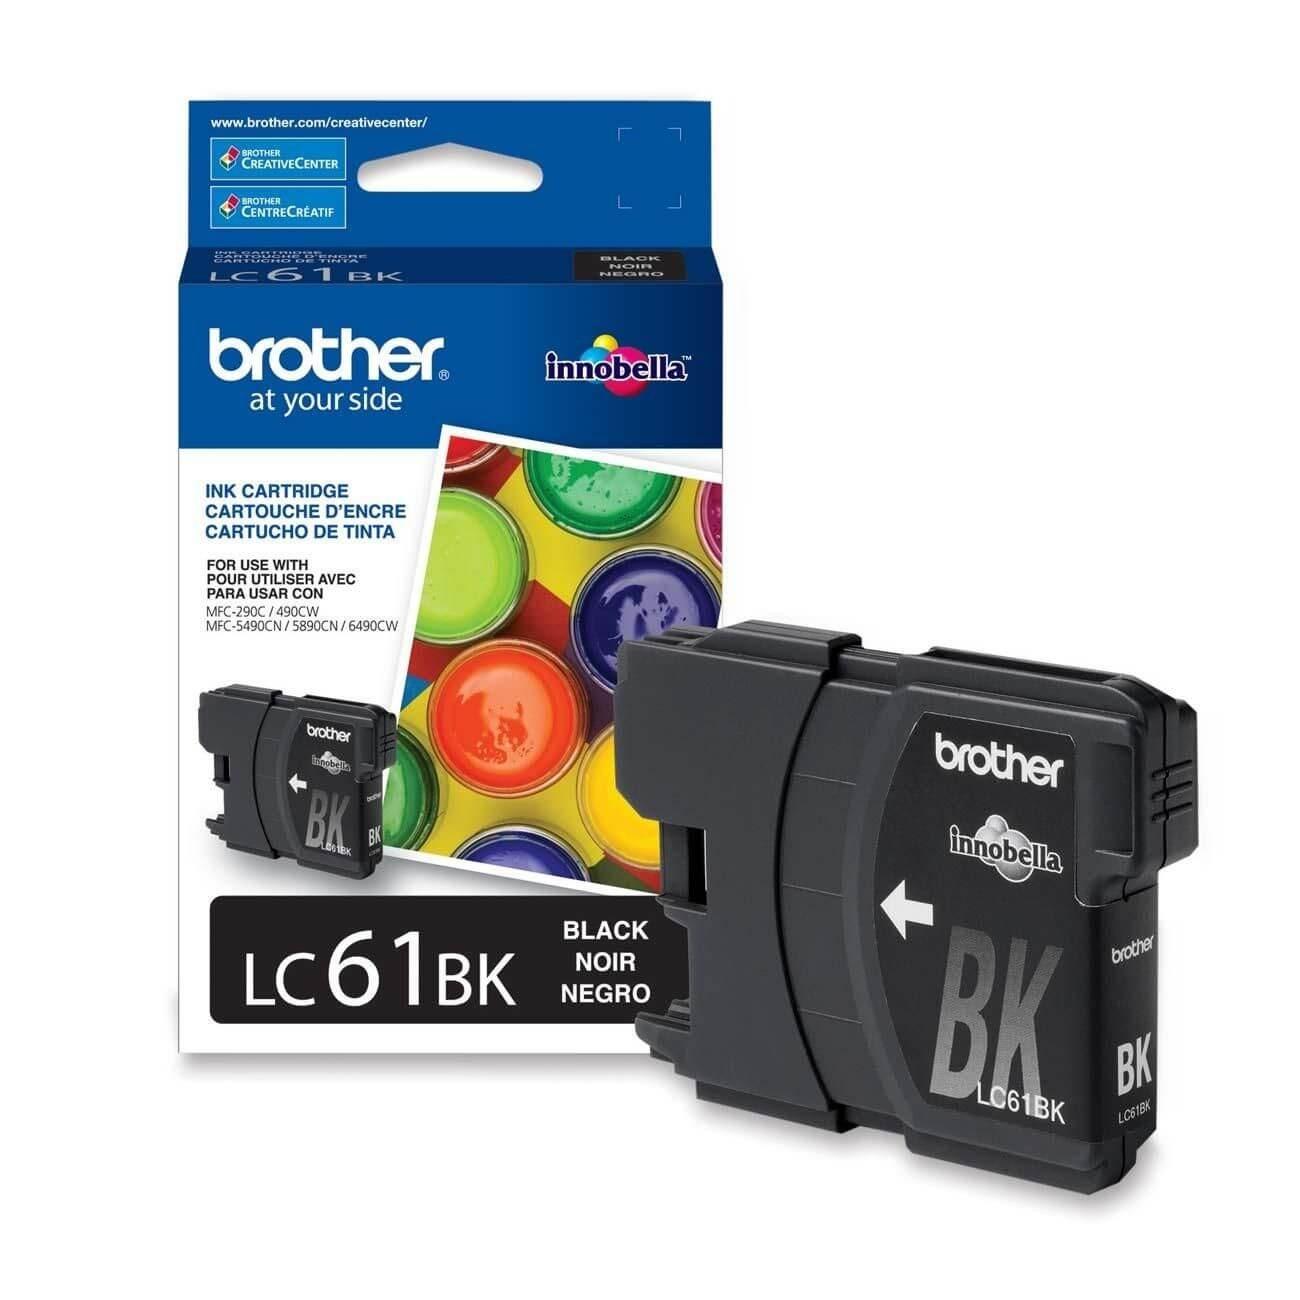 brother printer dcp j140w manual